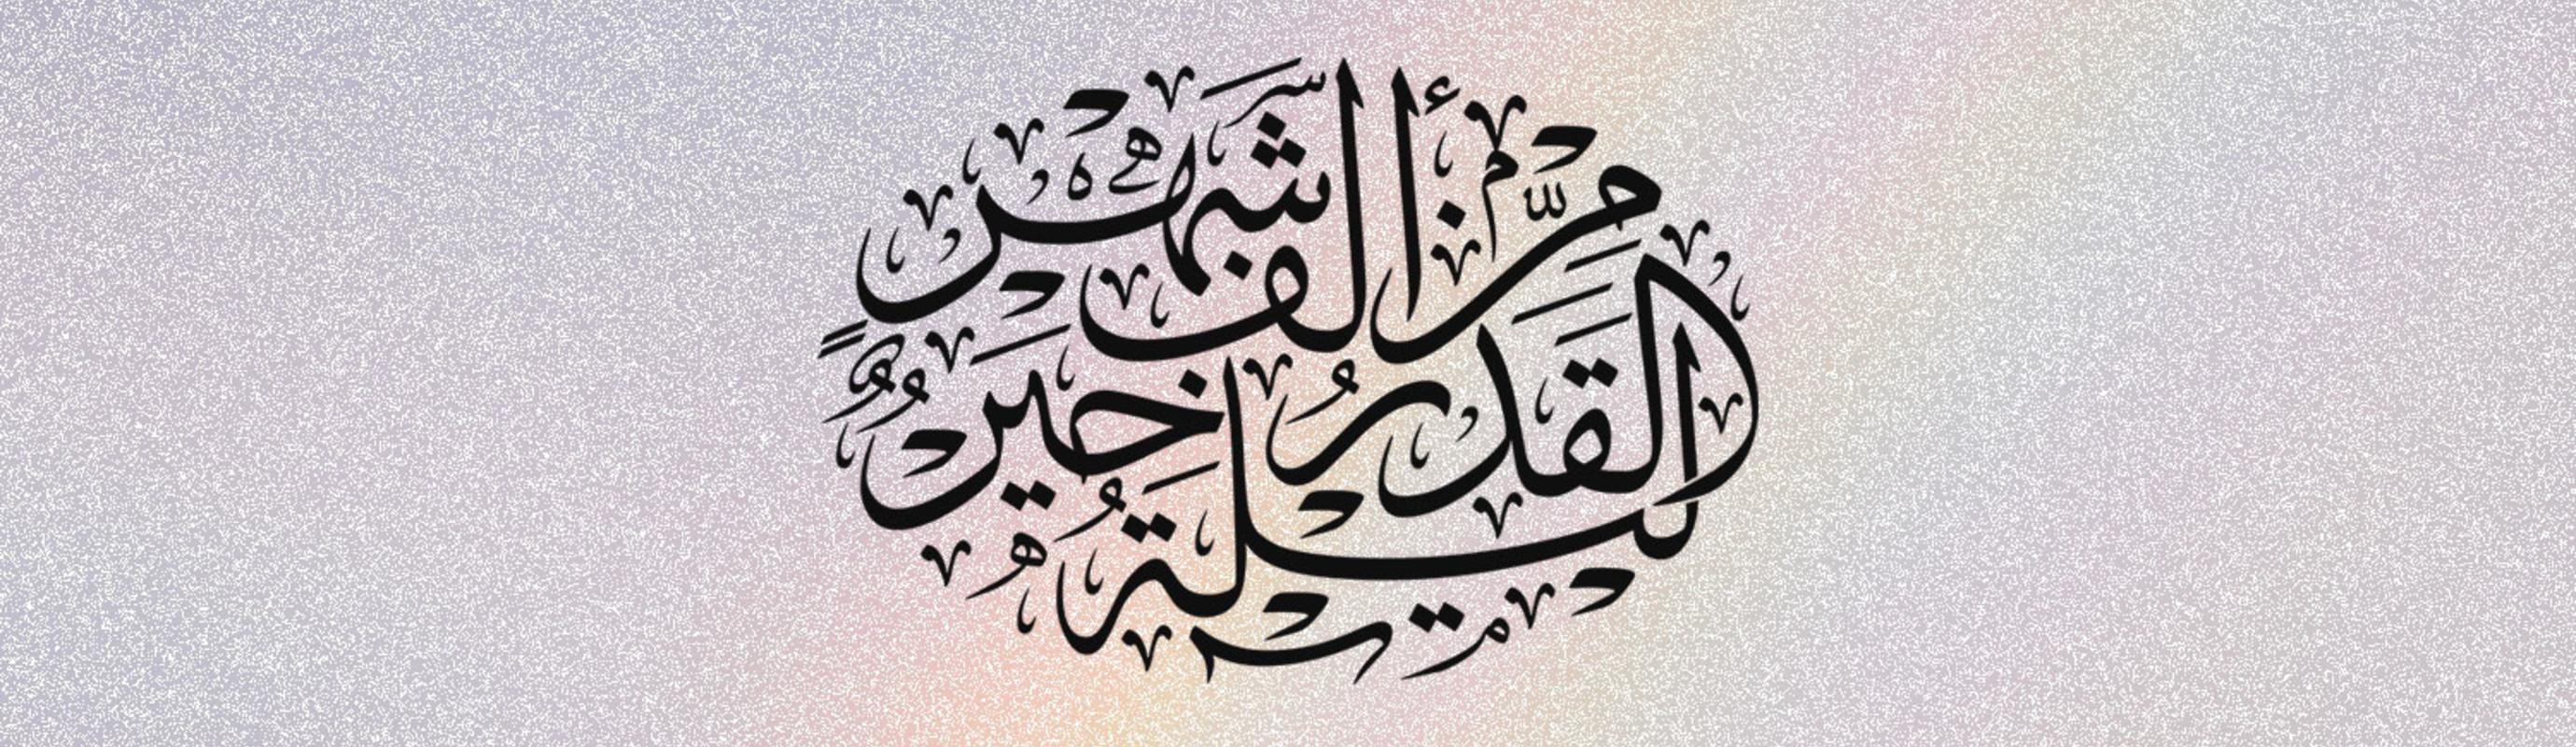 """..eve of Ramadhan 23, possible night of Qadr.."""